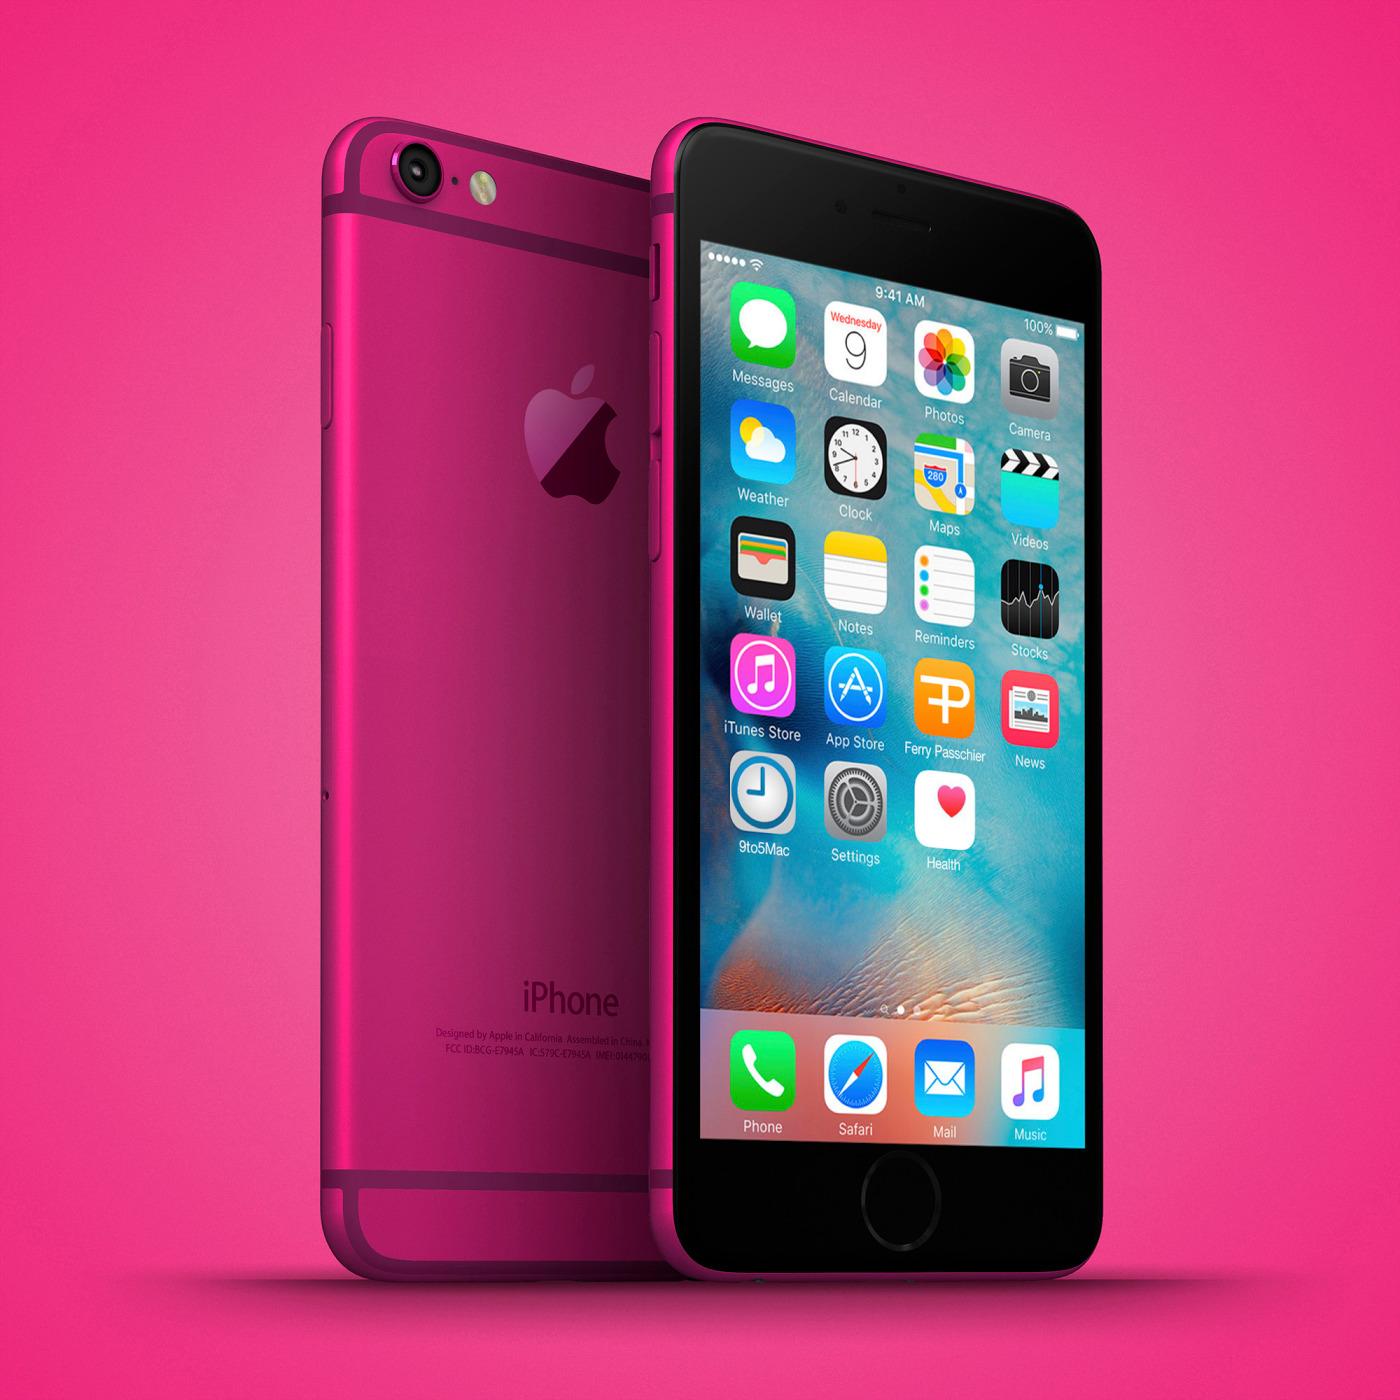 iphone-6c-pink_both